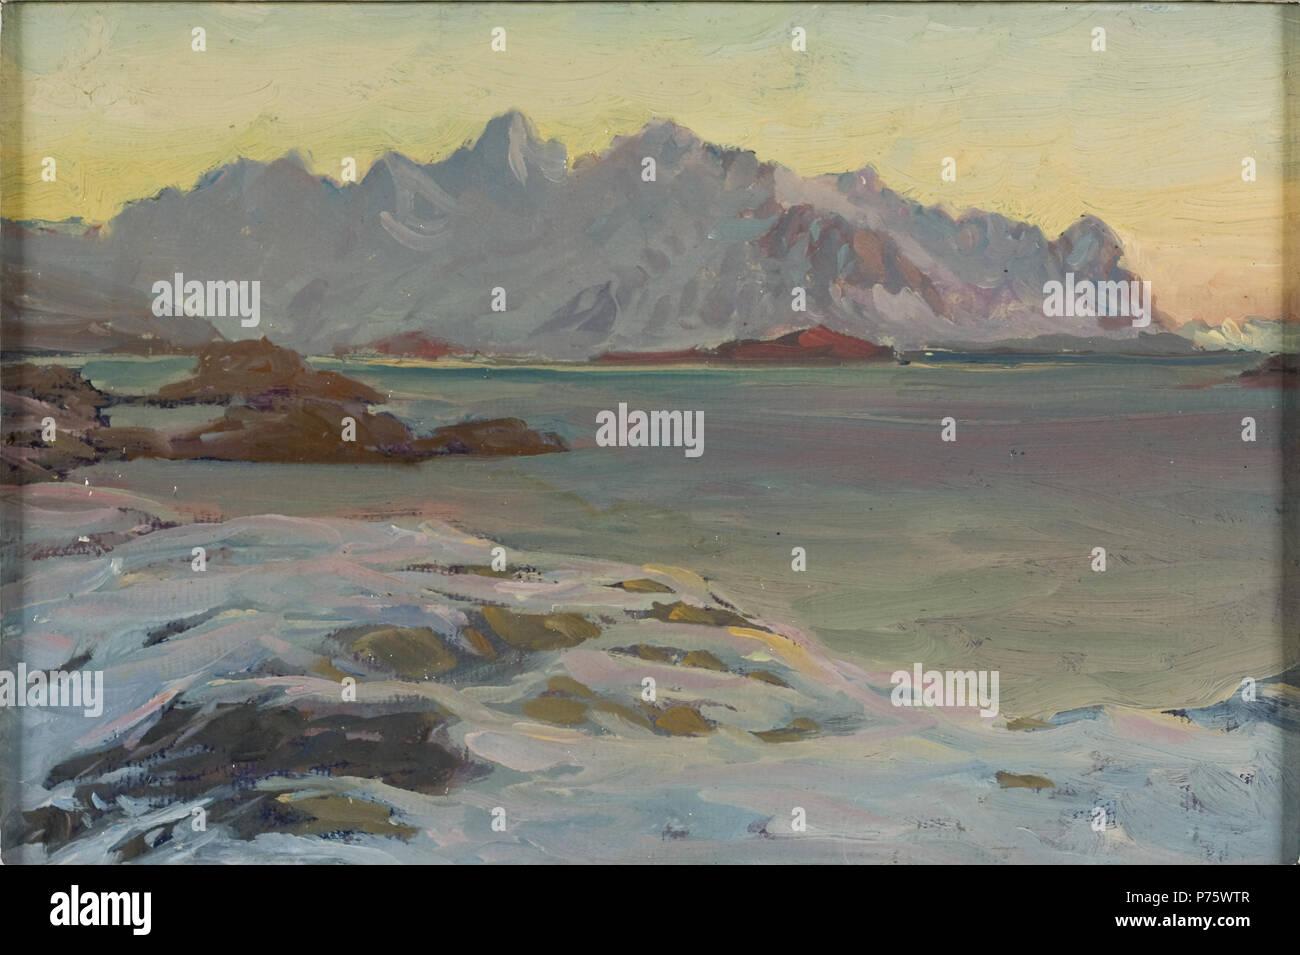 . Englisch: Berge. Studie von Nord Norwegen Svenska: Fjäll. Studie från Nordlandet Datum unbekannt 167 Berge. Studie von Nord Norwegen (Anna Boberg) - Nationalmuseum - 21358 Stockbild